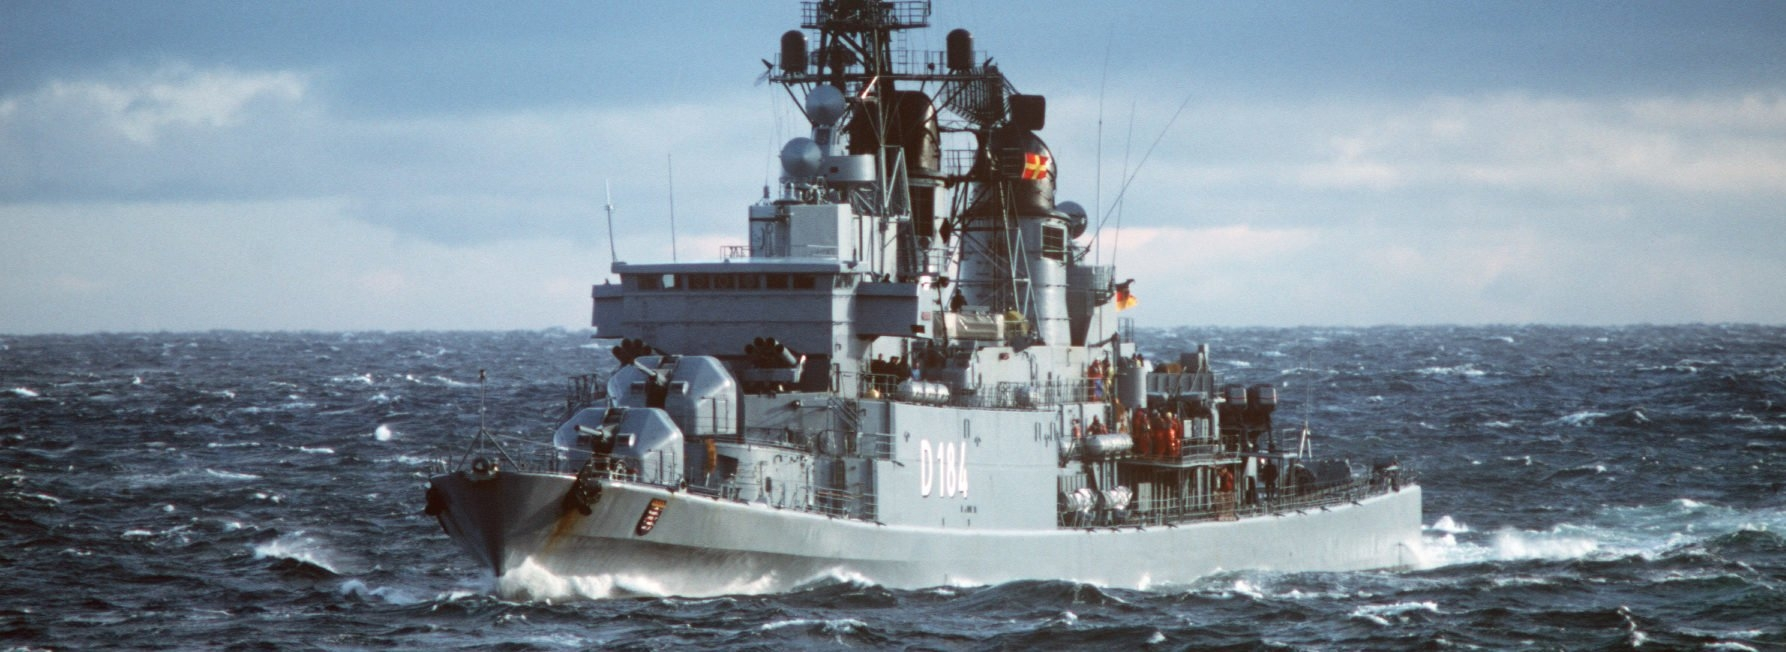 Type 101 Hamburg Class Destroyers (1960) with Hamburg Class Of 2021